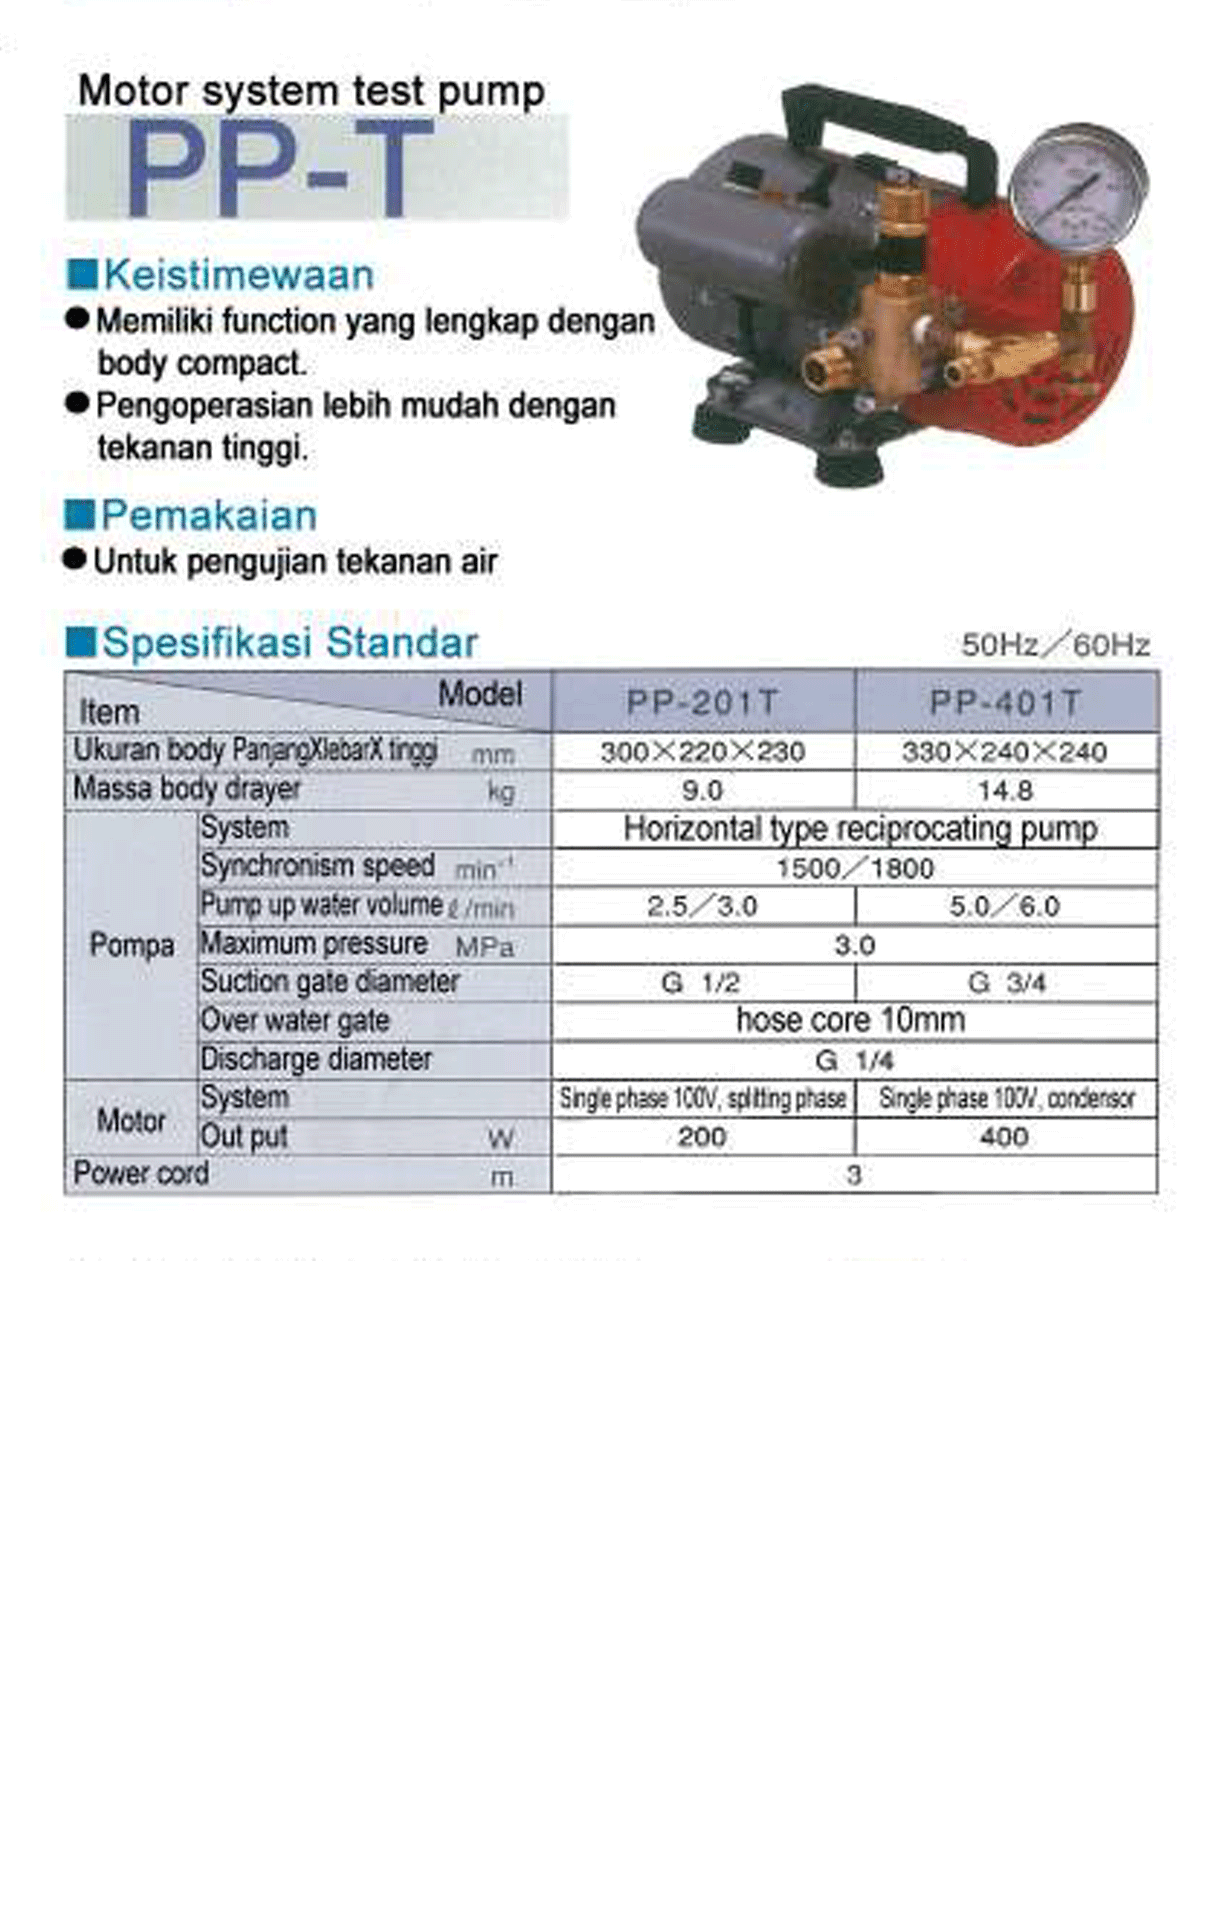 Test Pump PP-T